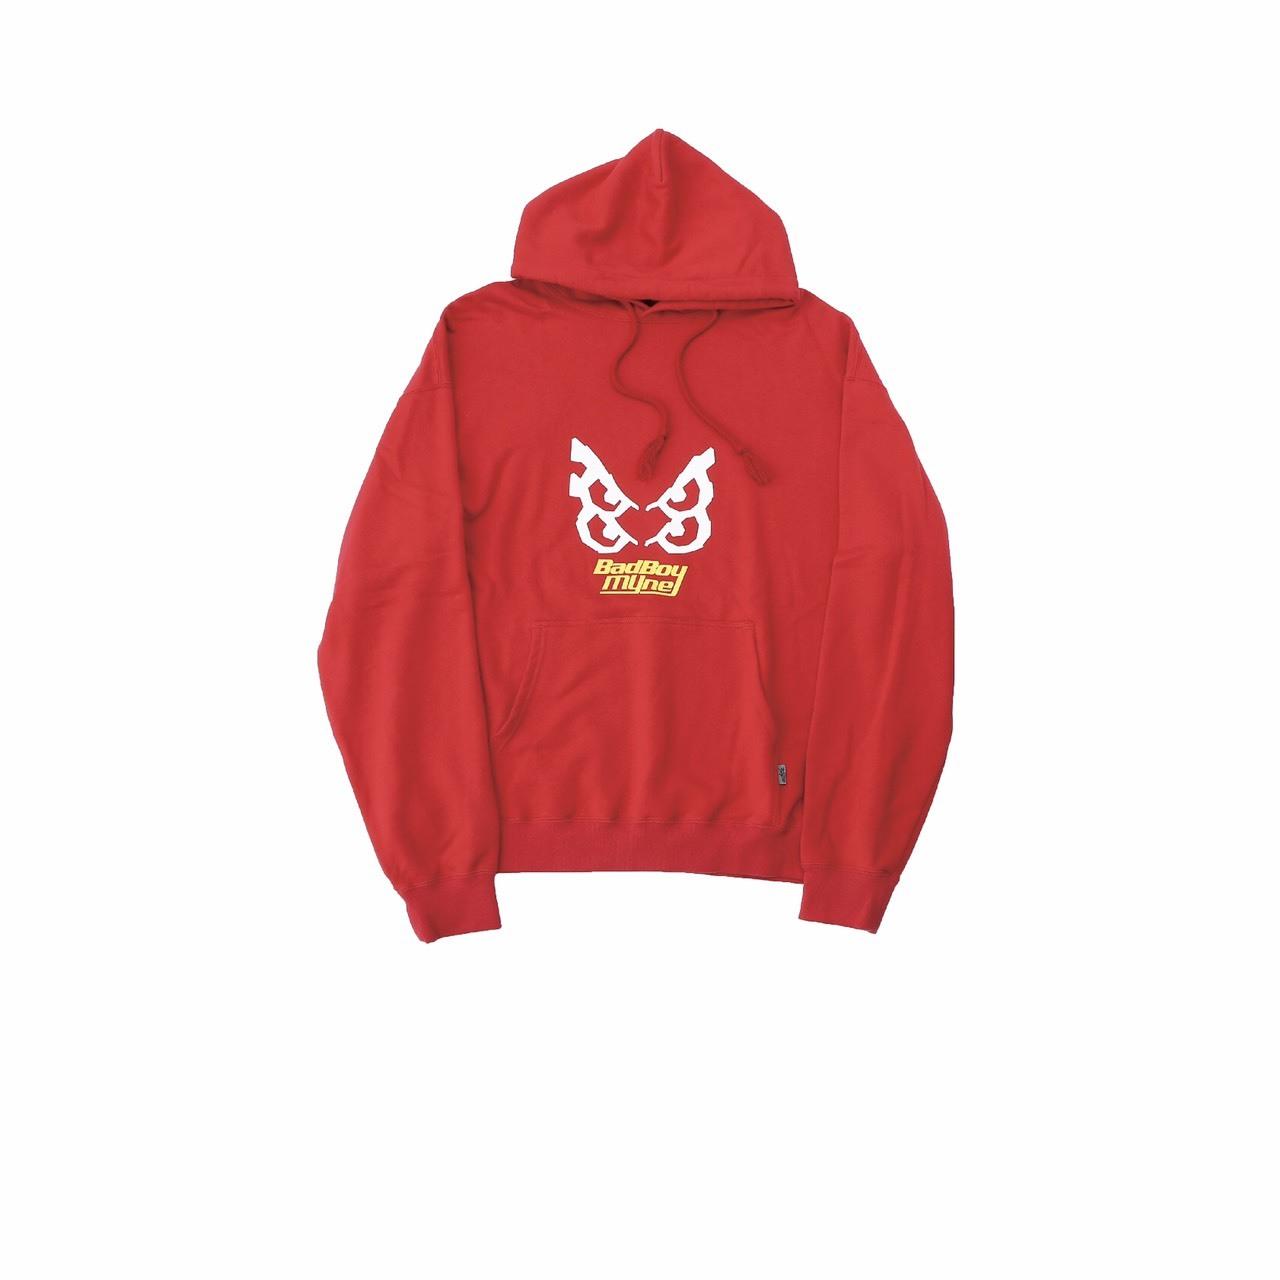 【10%OFF】MYne × BADBOY hoodie / RED - 画像1